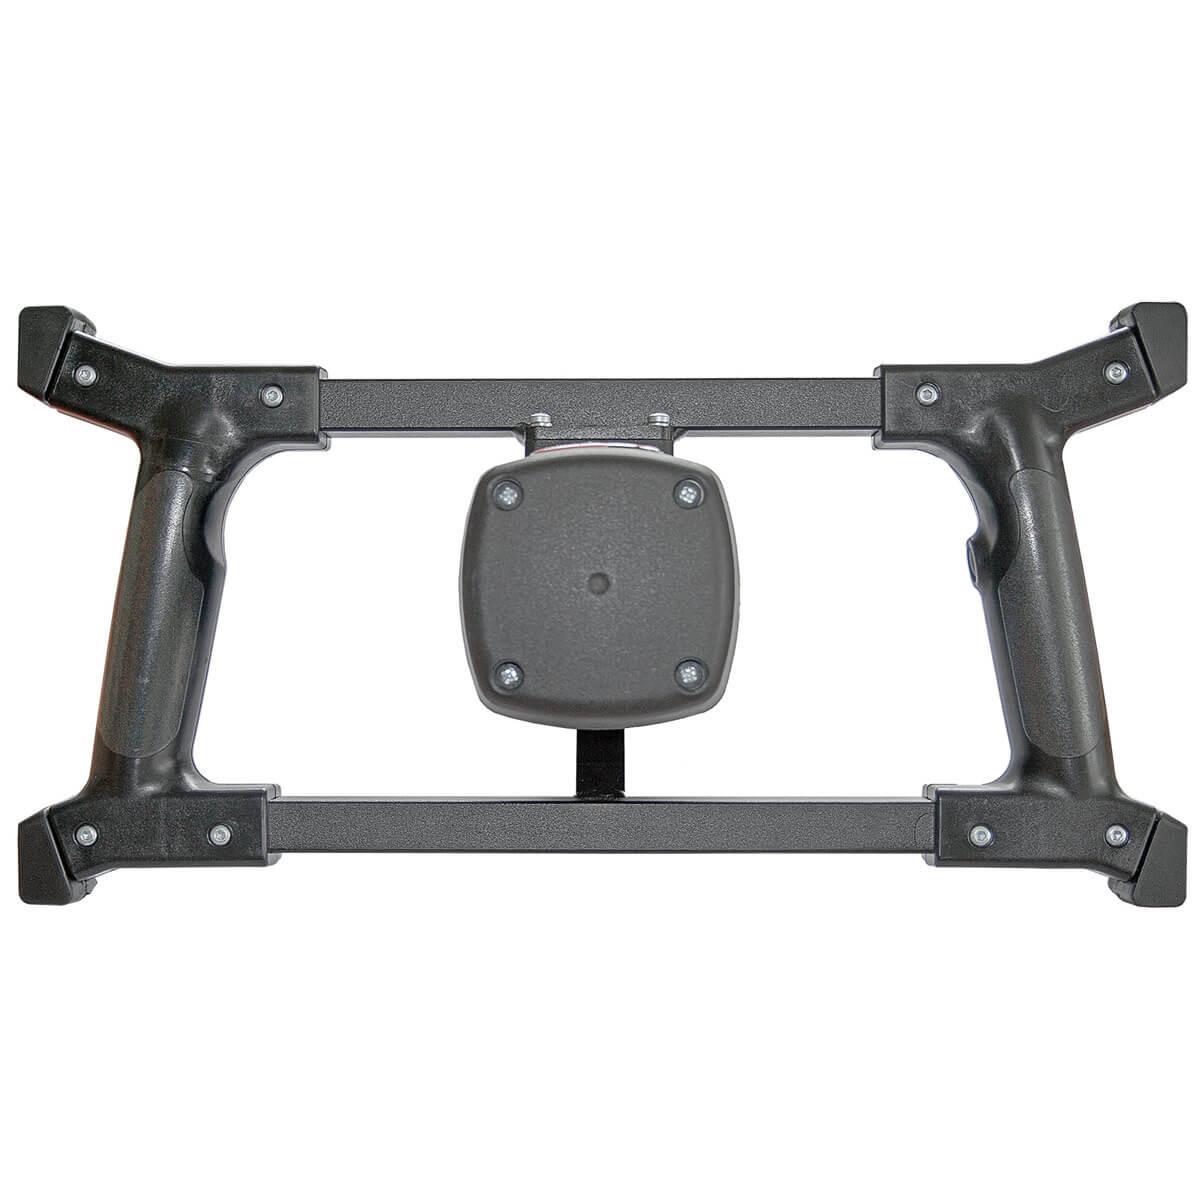 Eibenstock EHR 18S H frame mixer handle for jobsite use heavy duty construction rated